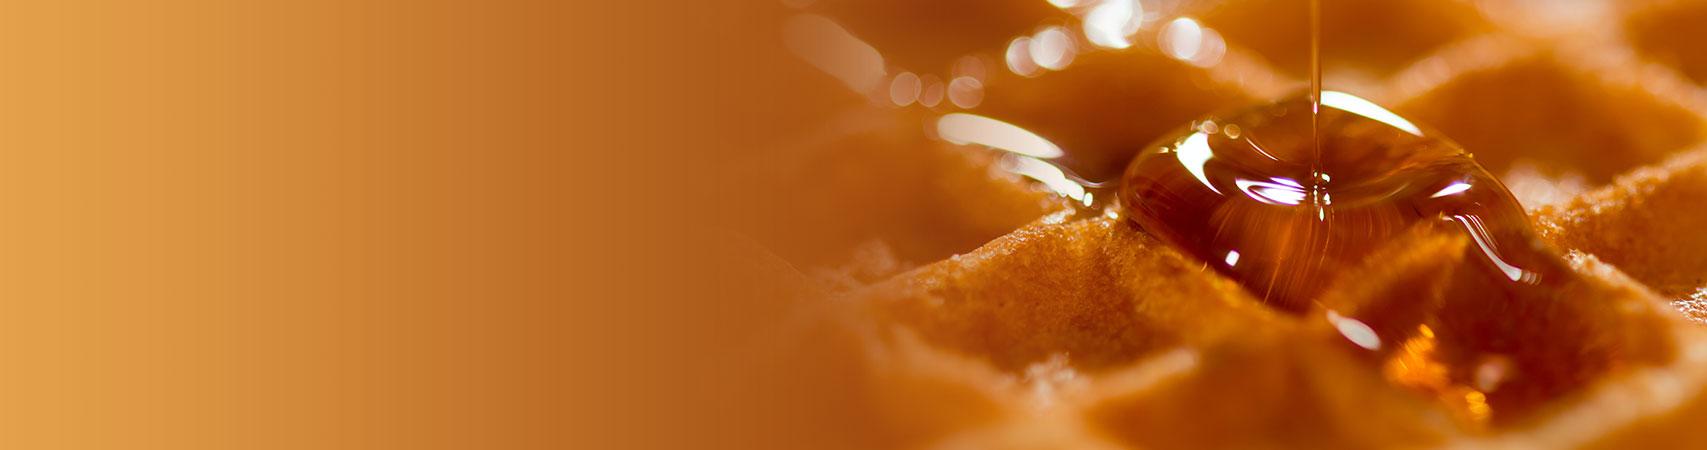 LECO-Europe-waffles (LECO-Europe-gaufres)